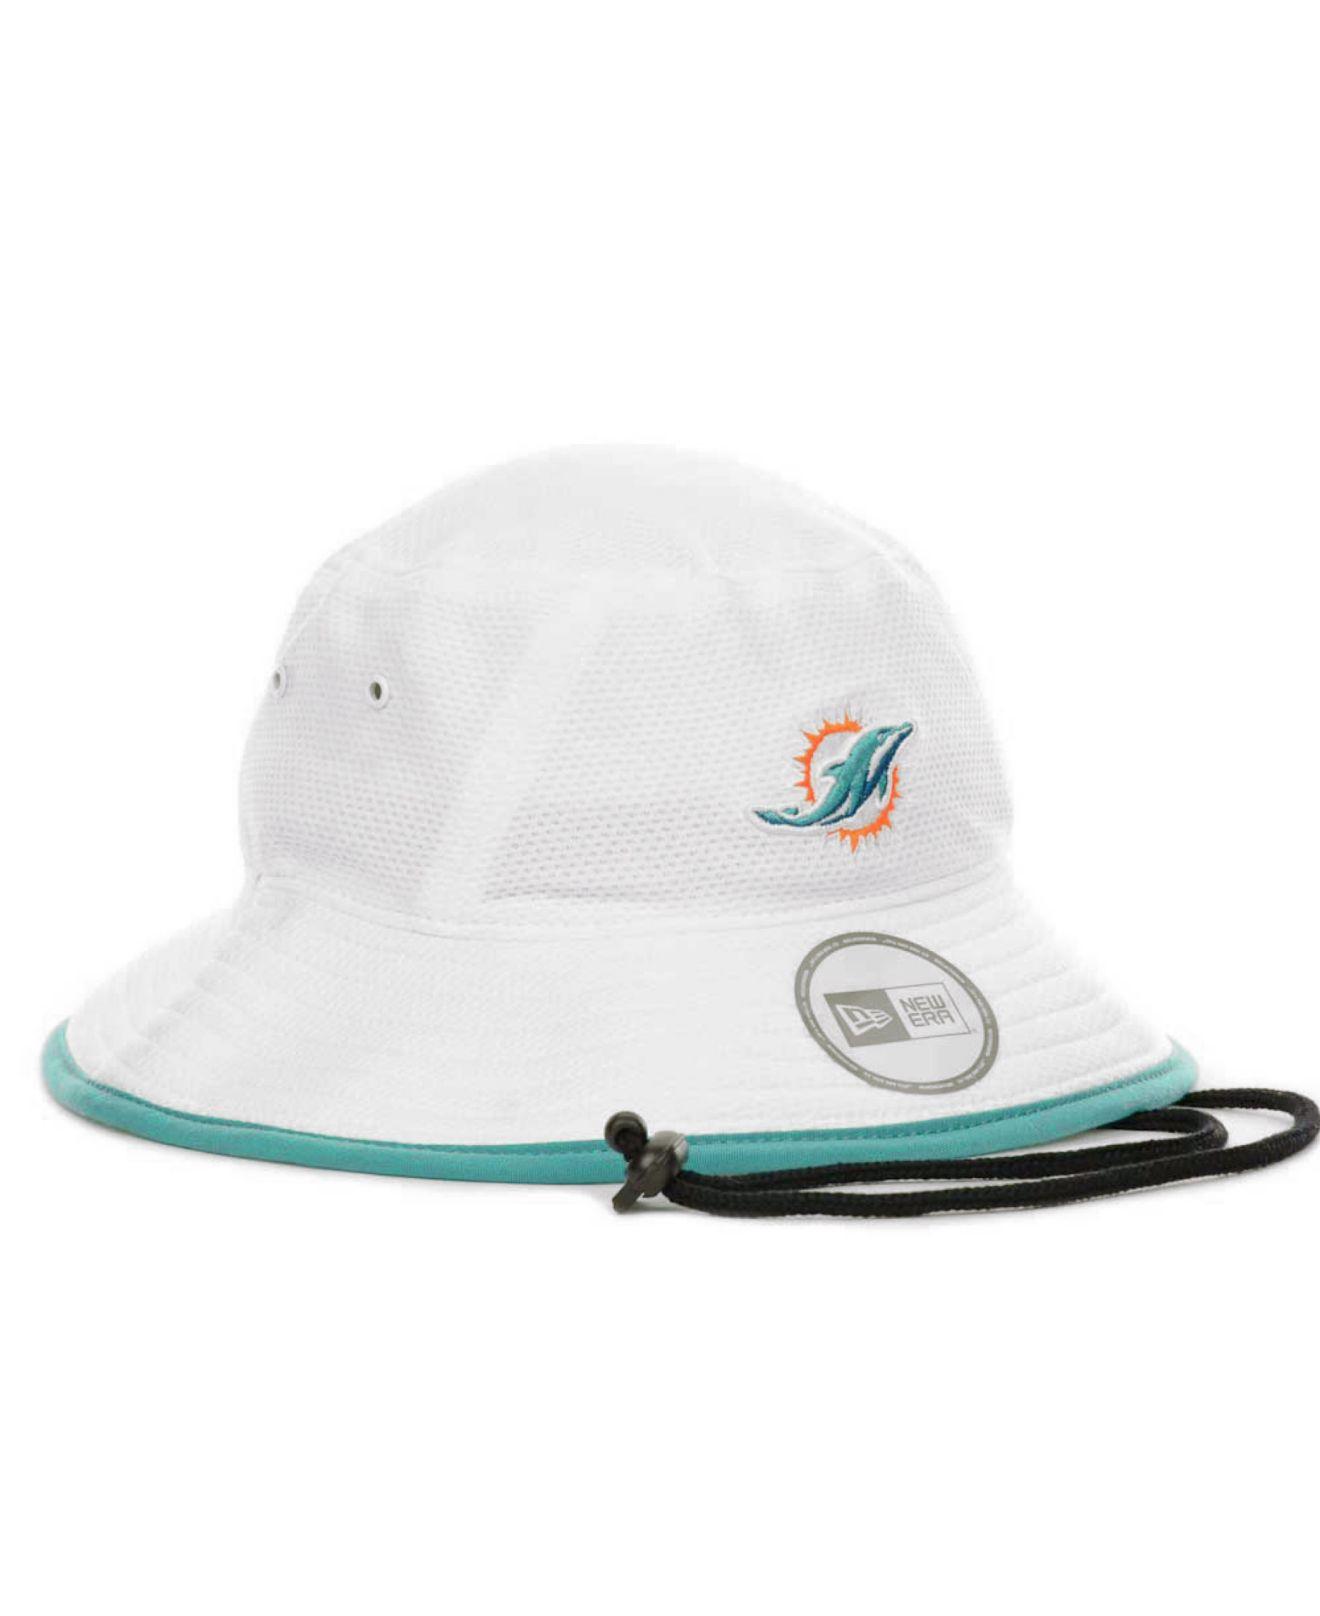 huge discount 0adc1 16a75 ... germany miami dolphins bucket hat new era cap 8822d 64d32